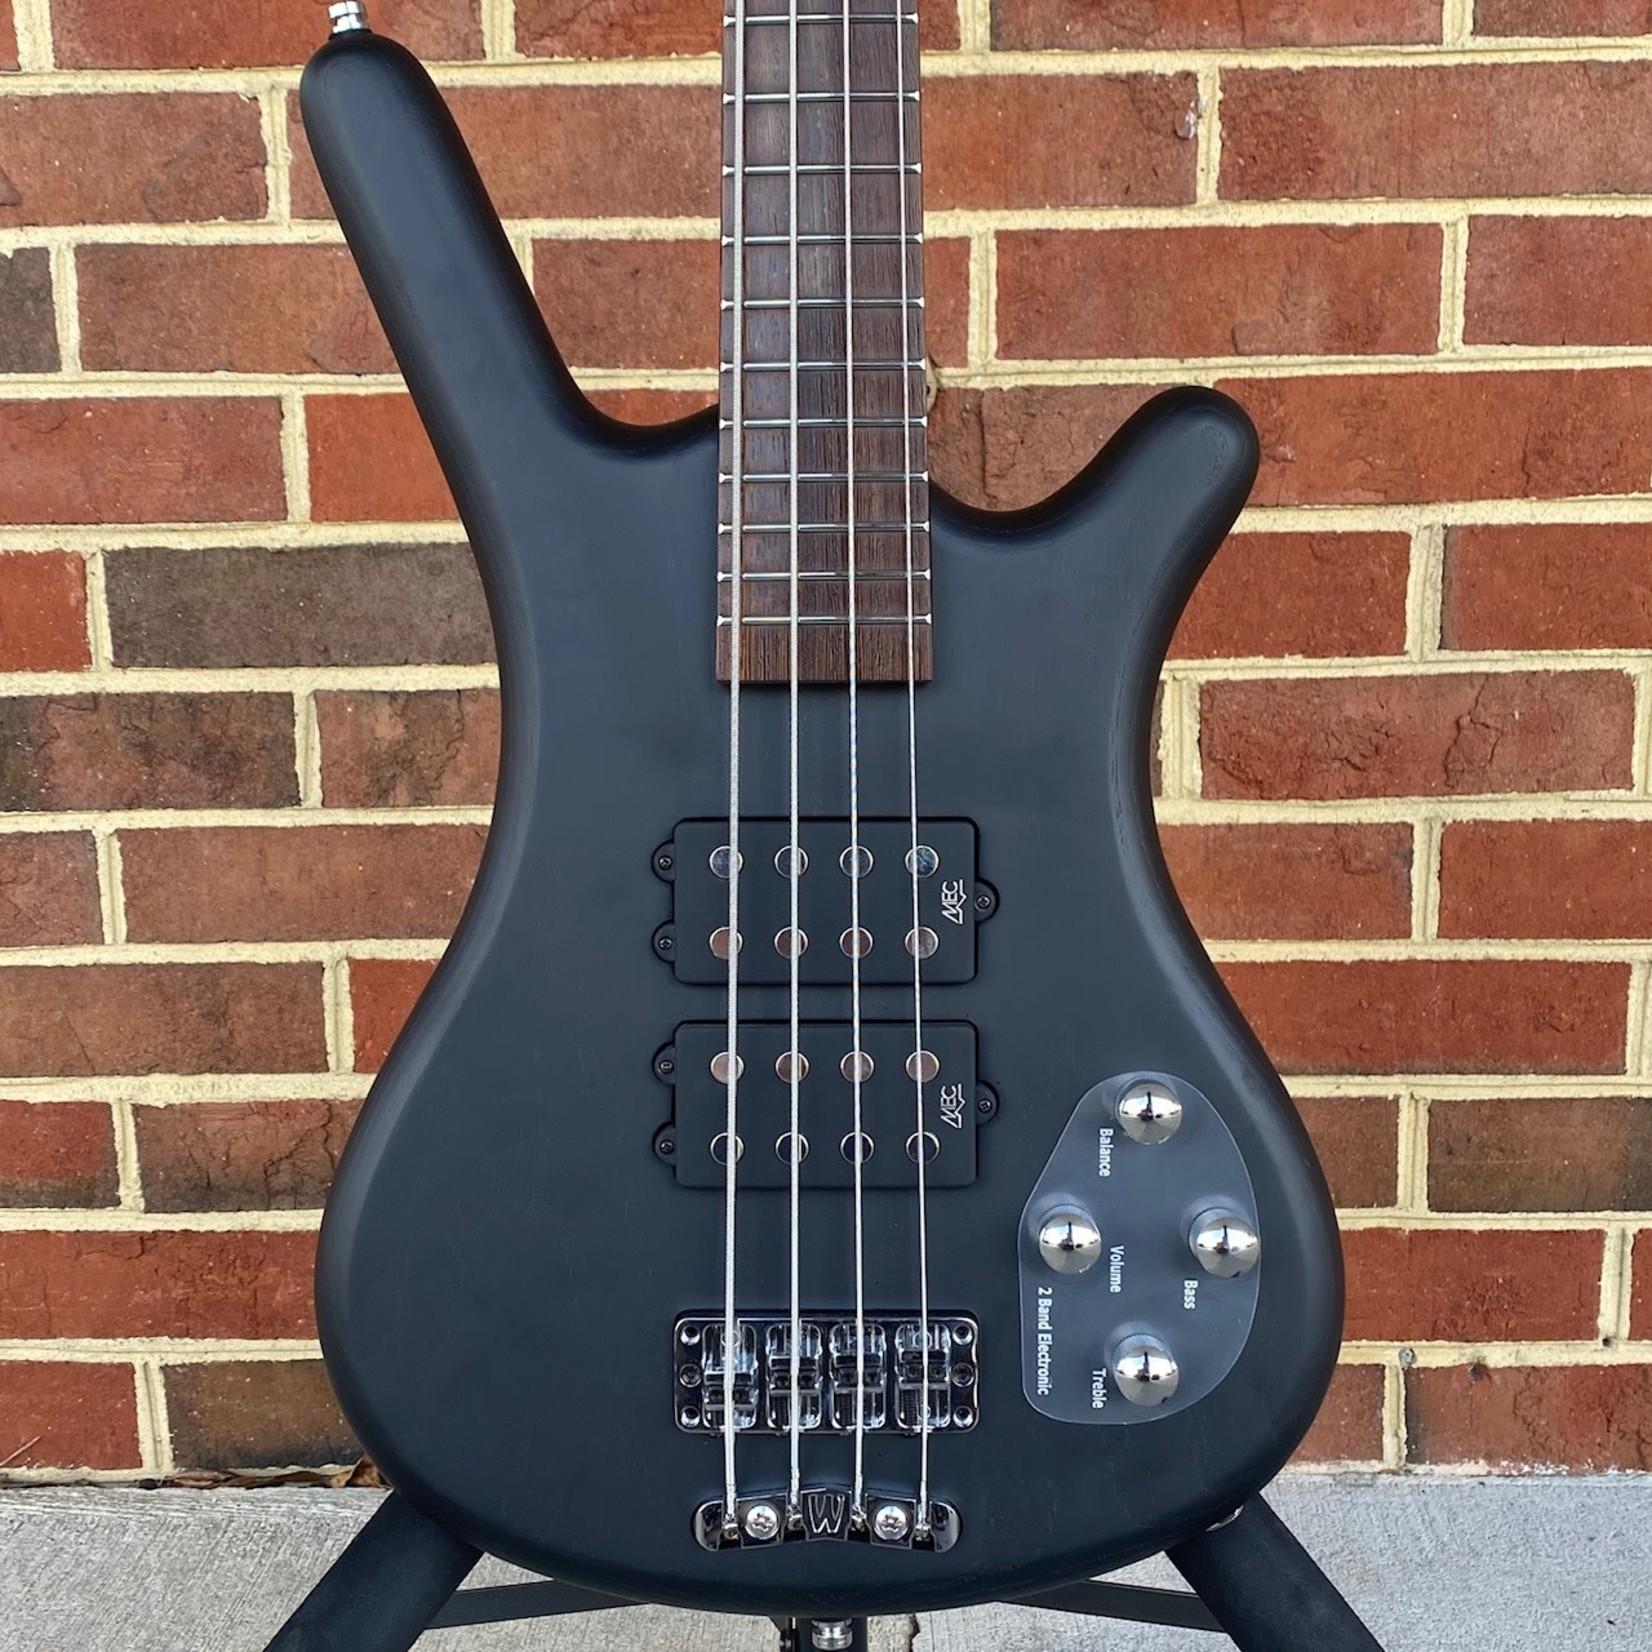 Warwick Warwick Rockbass Corvette $$, 4-String, Nirvana Black Satin, Gig Bag